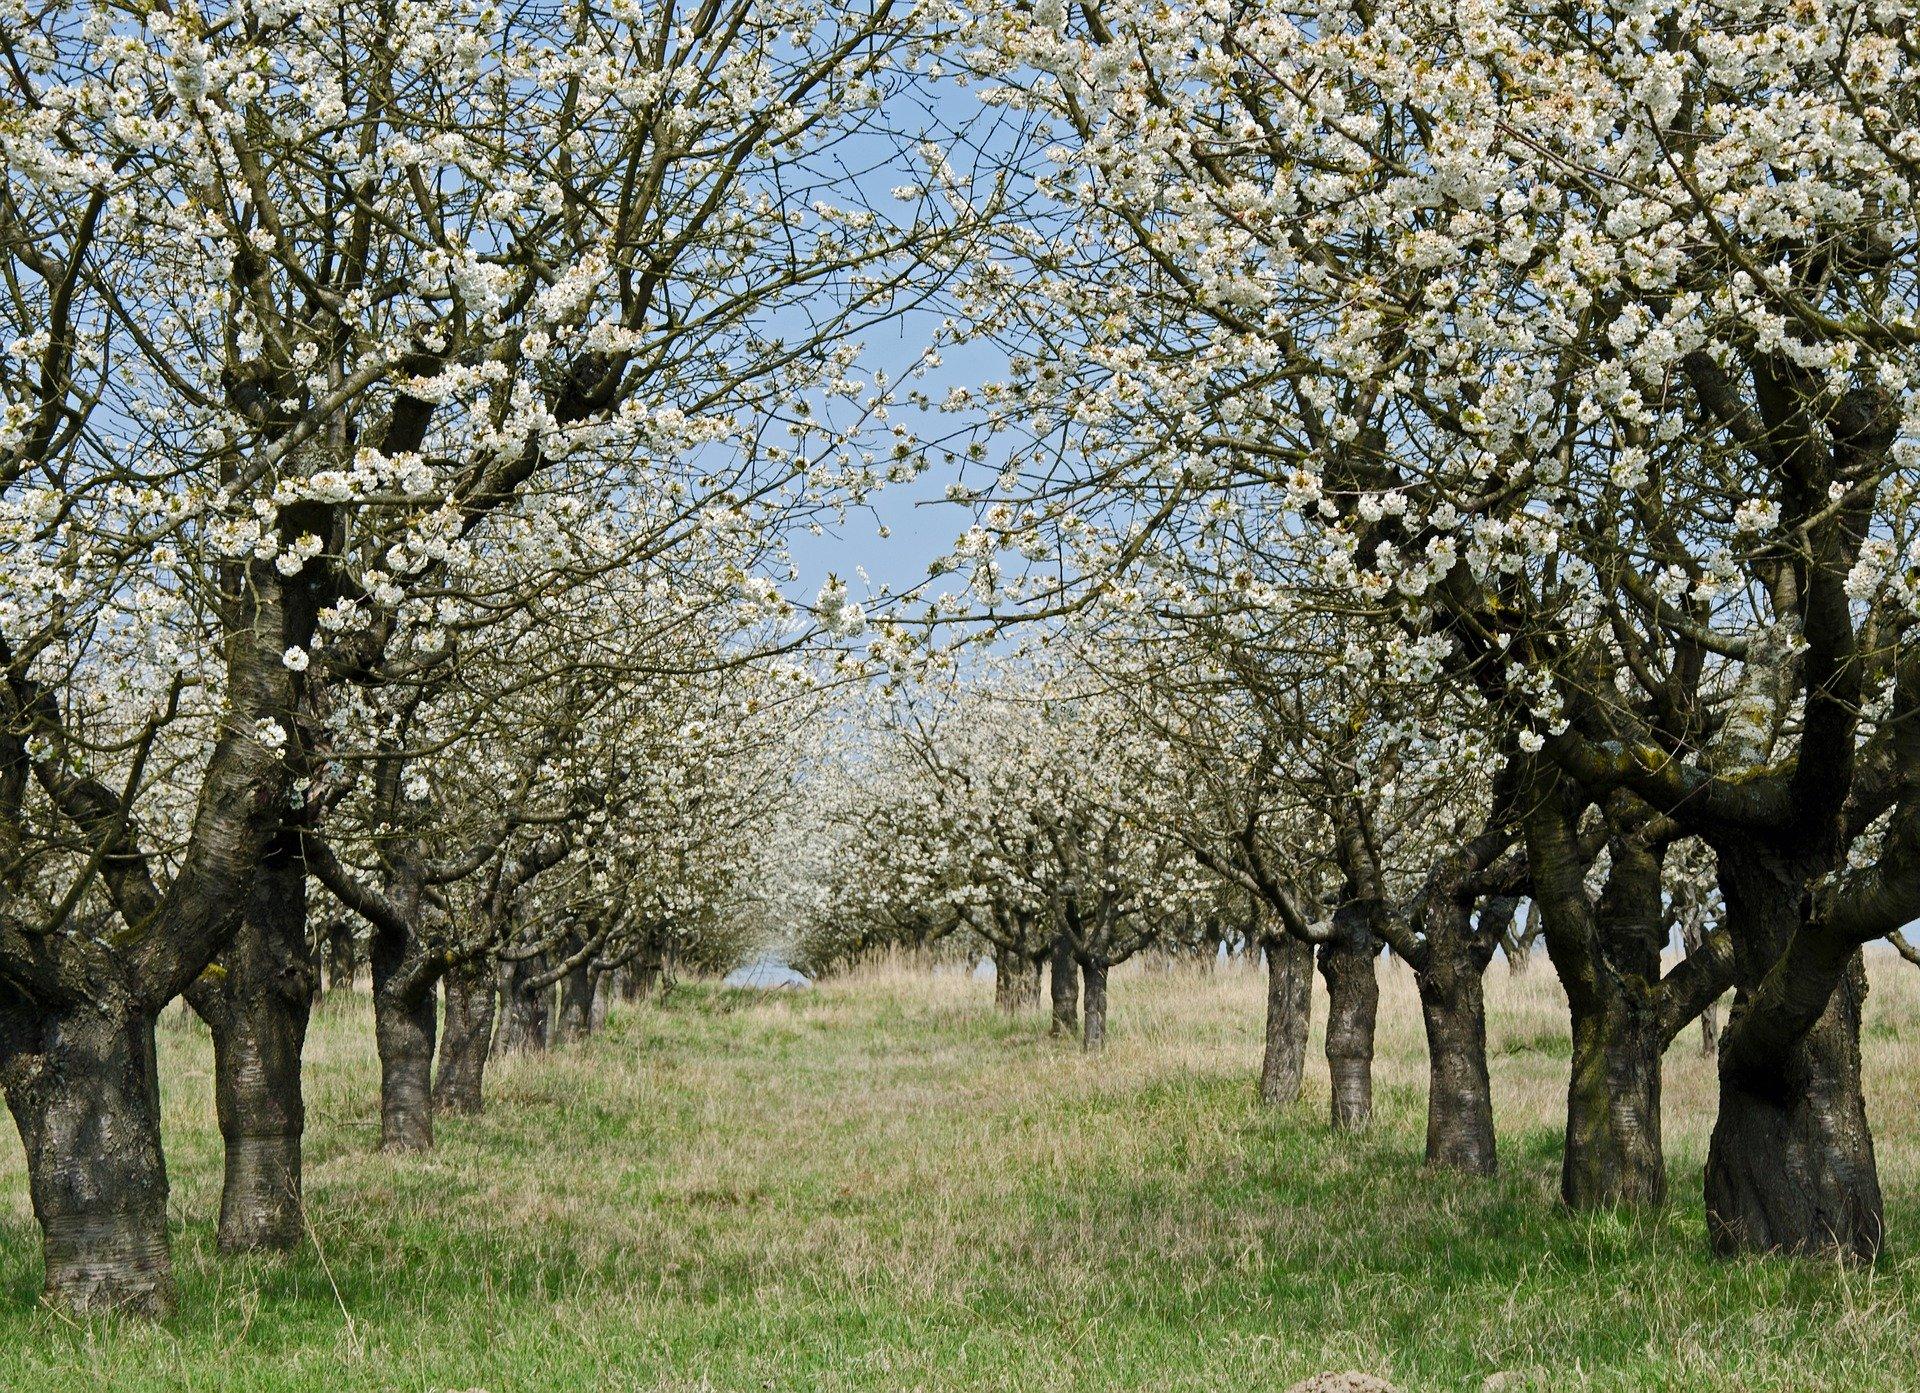 Obstbaumpflegeschnitt im Naturpark Aukrug